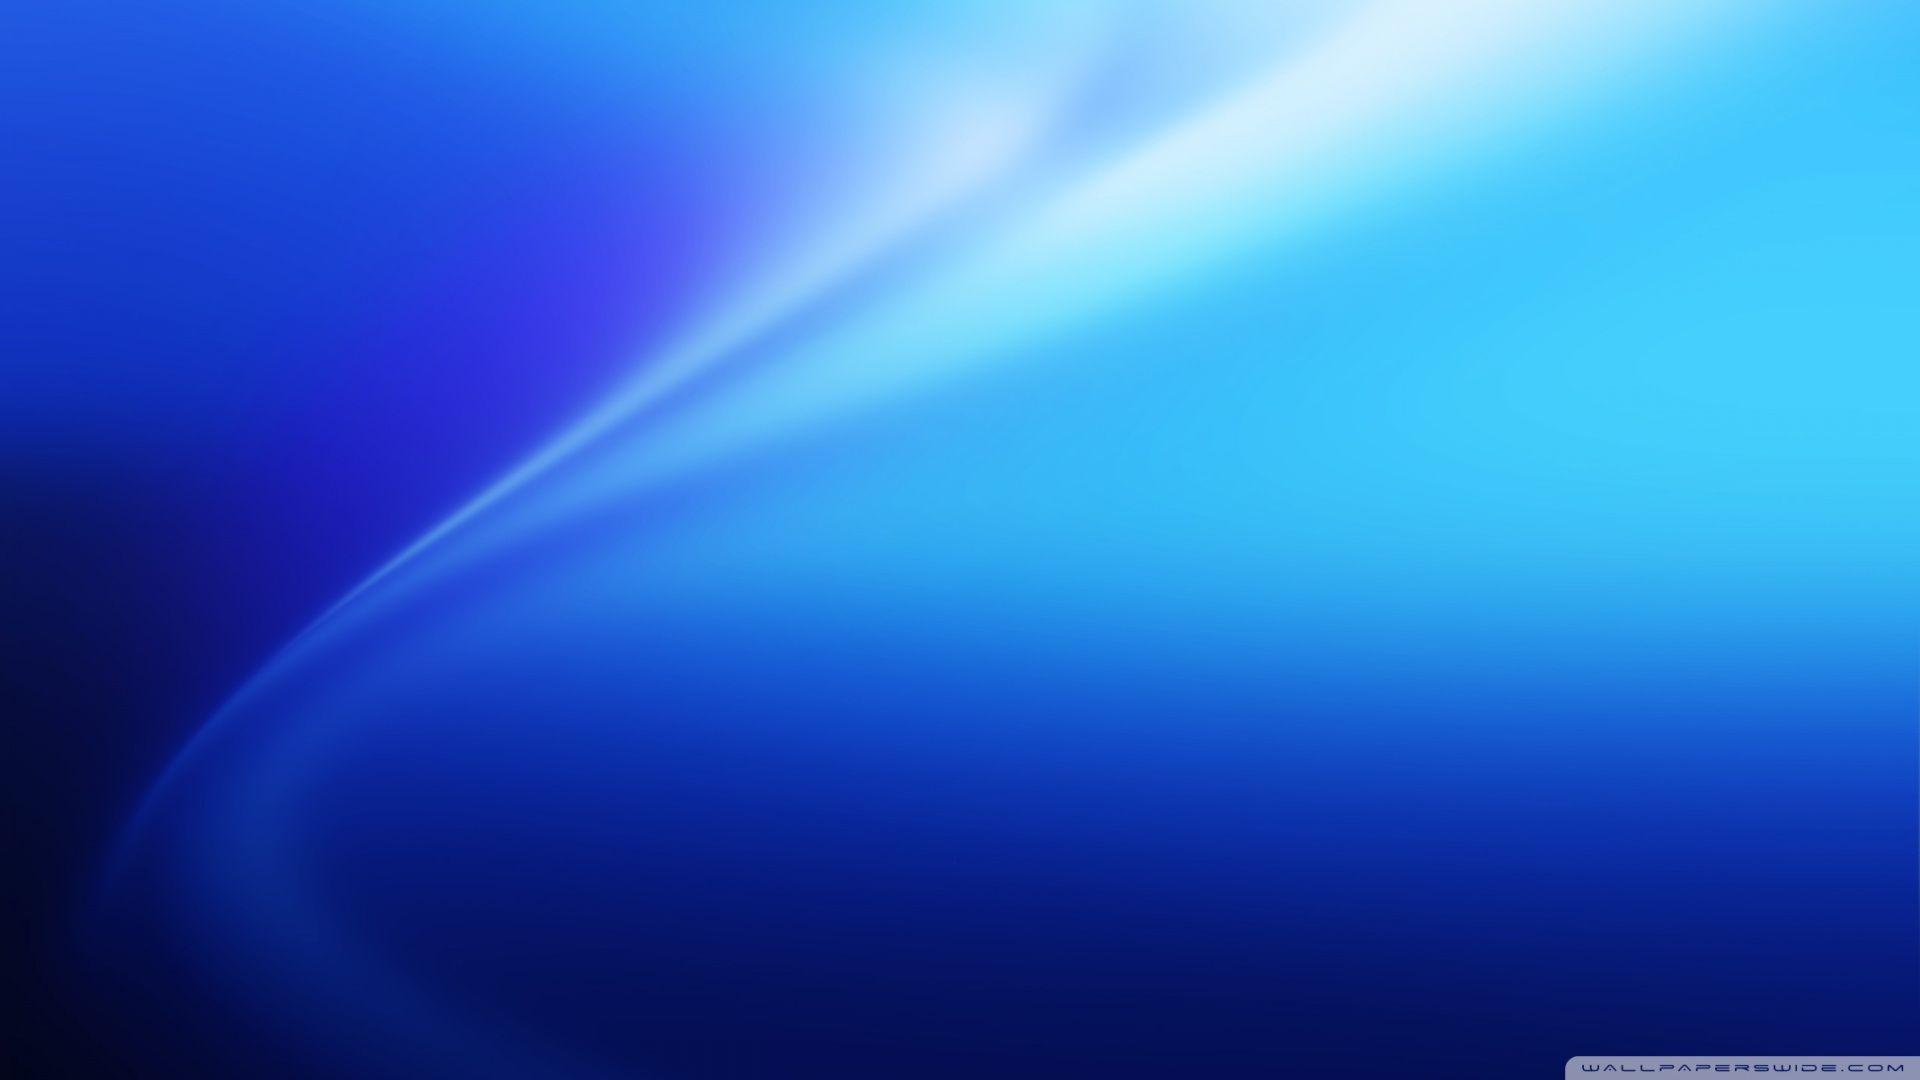 YS High Resolution Blue Background Wallpaper Blue